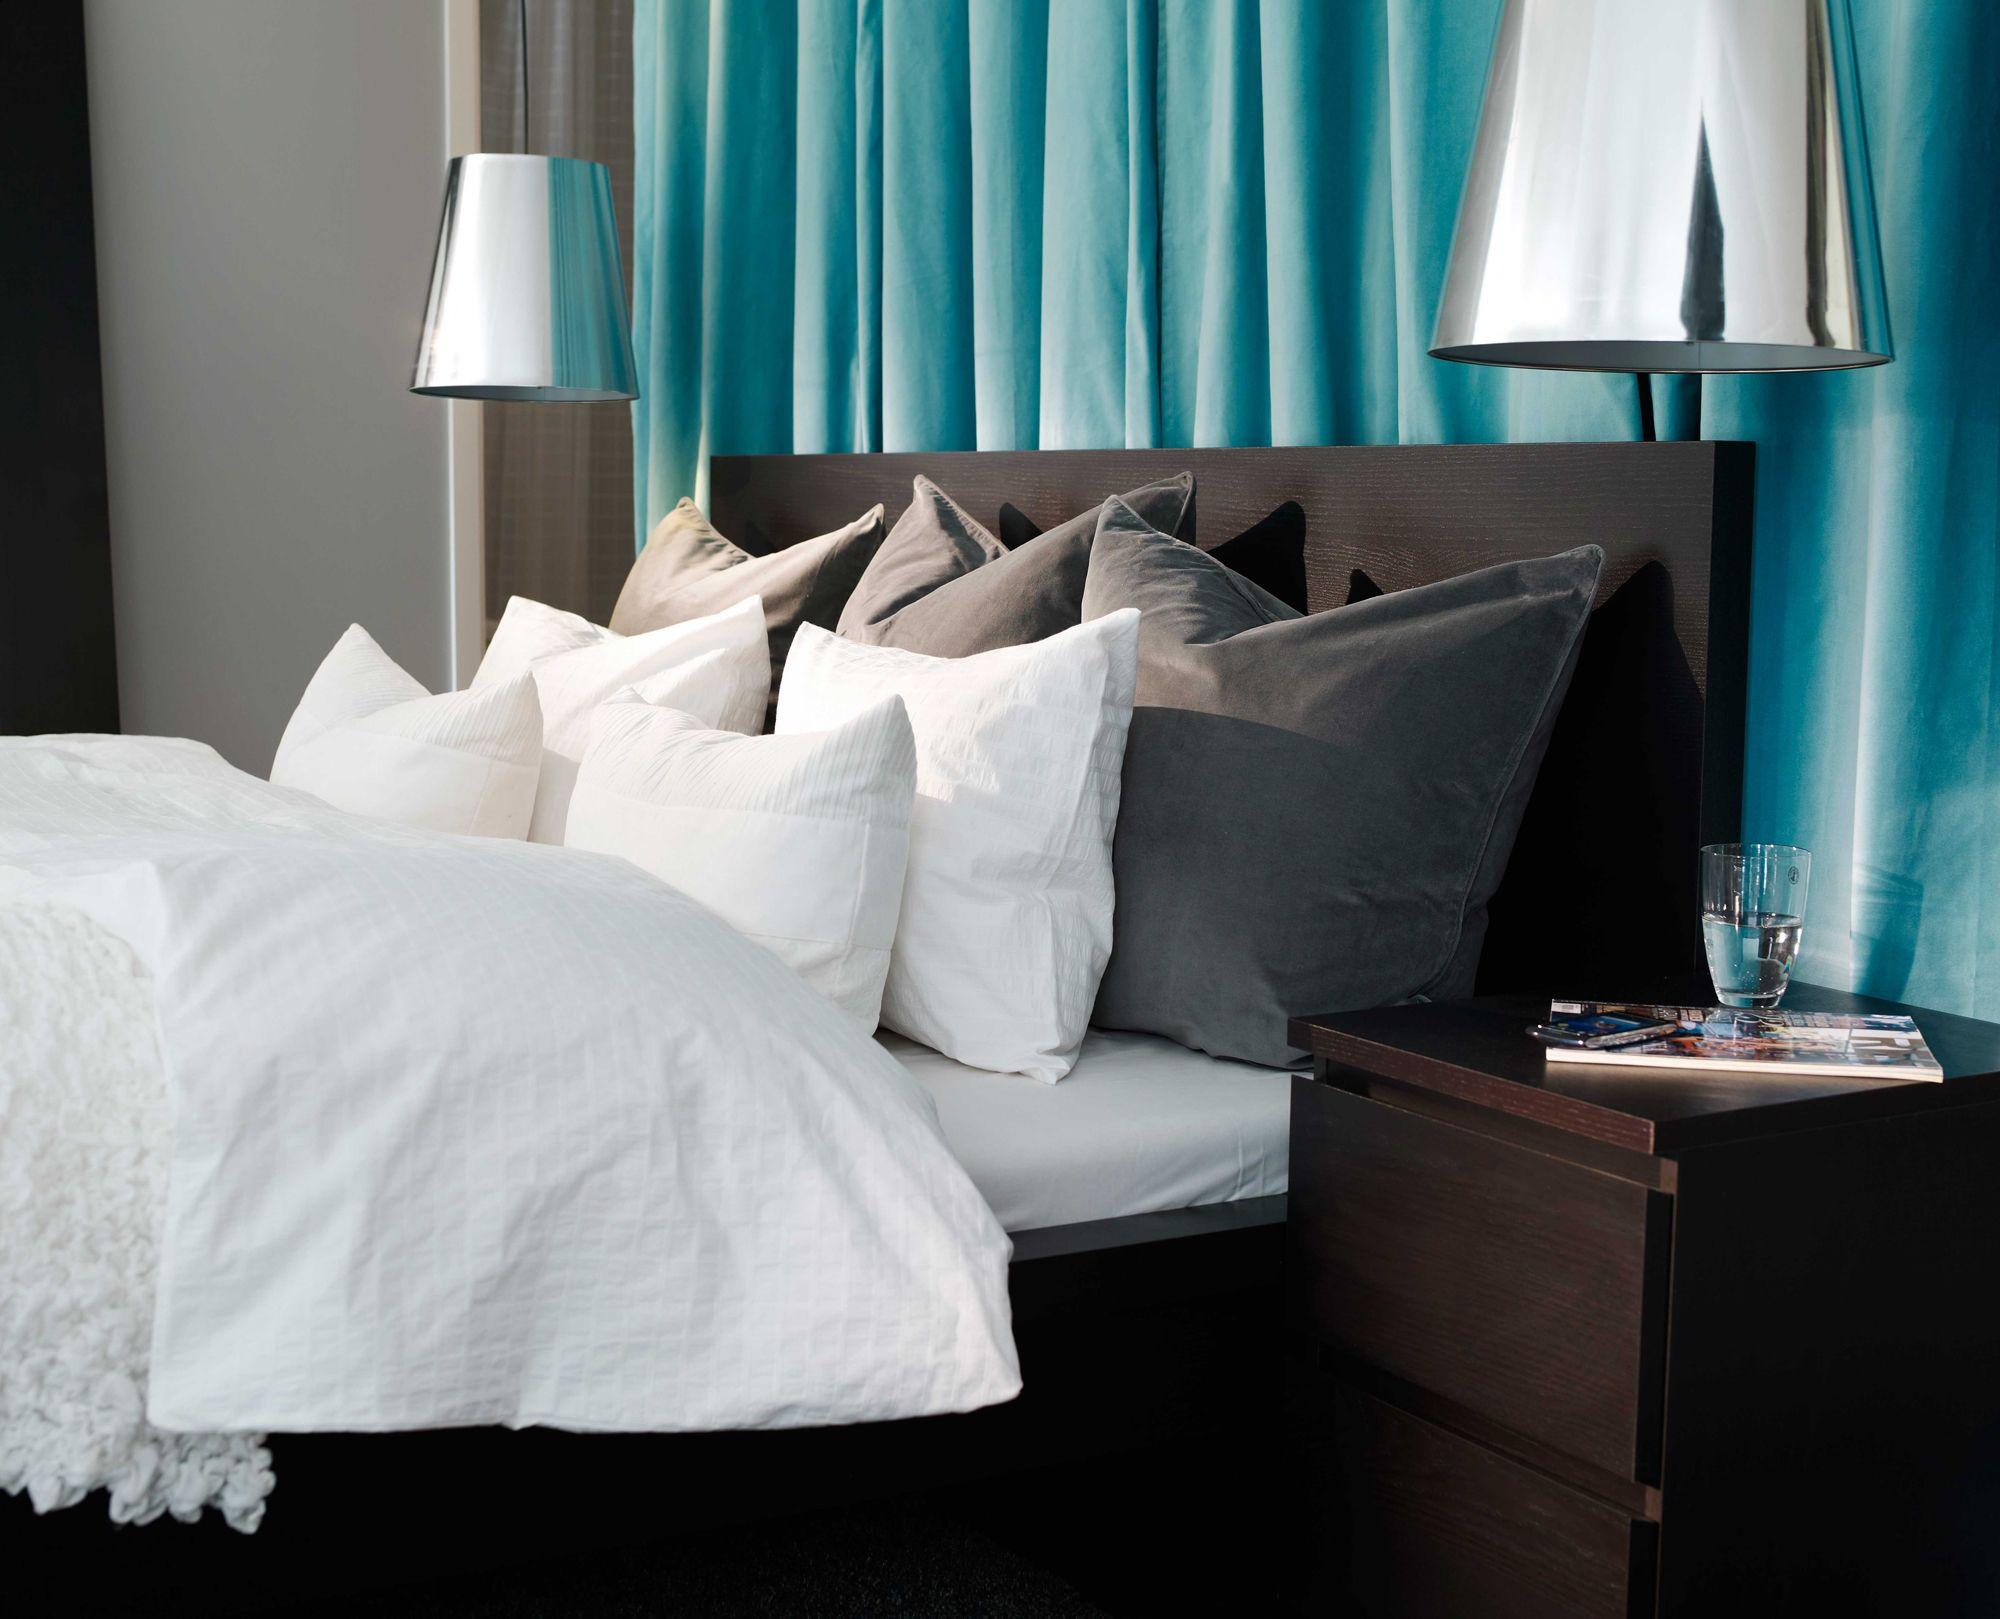 ikea sterreich inspiration textilien lampenschirm gnejs kissen gosa pinje bettgestell malm. Black Bedroom Furniture Sets. Home Design Ideas